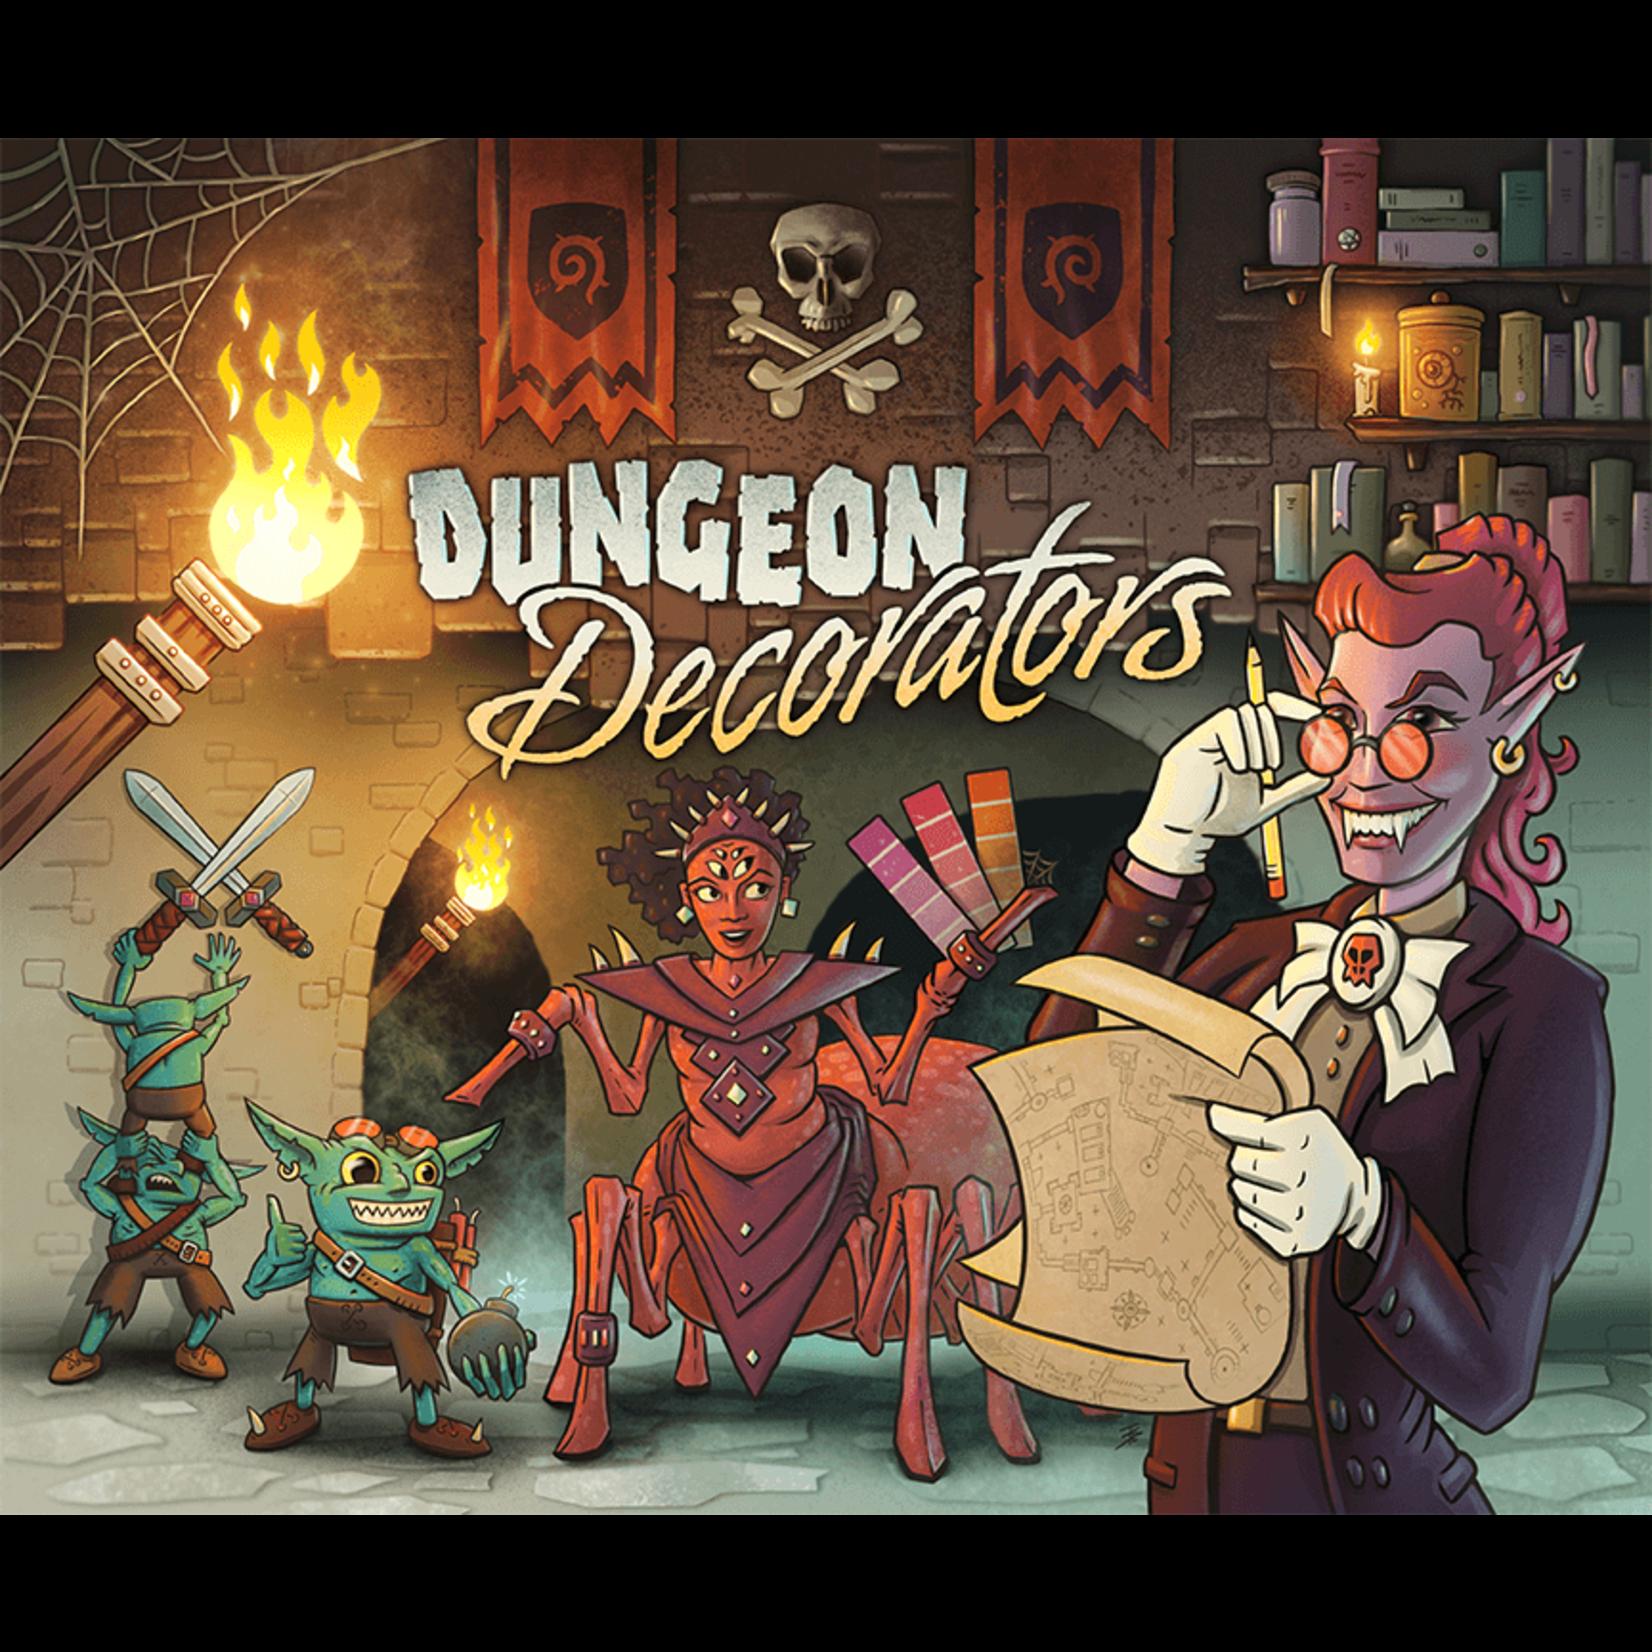 Dungeon Decorators